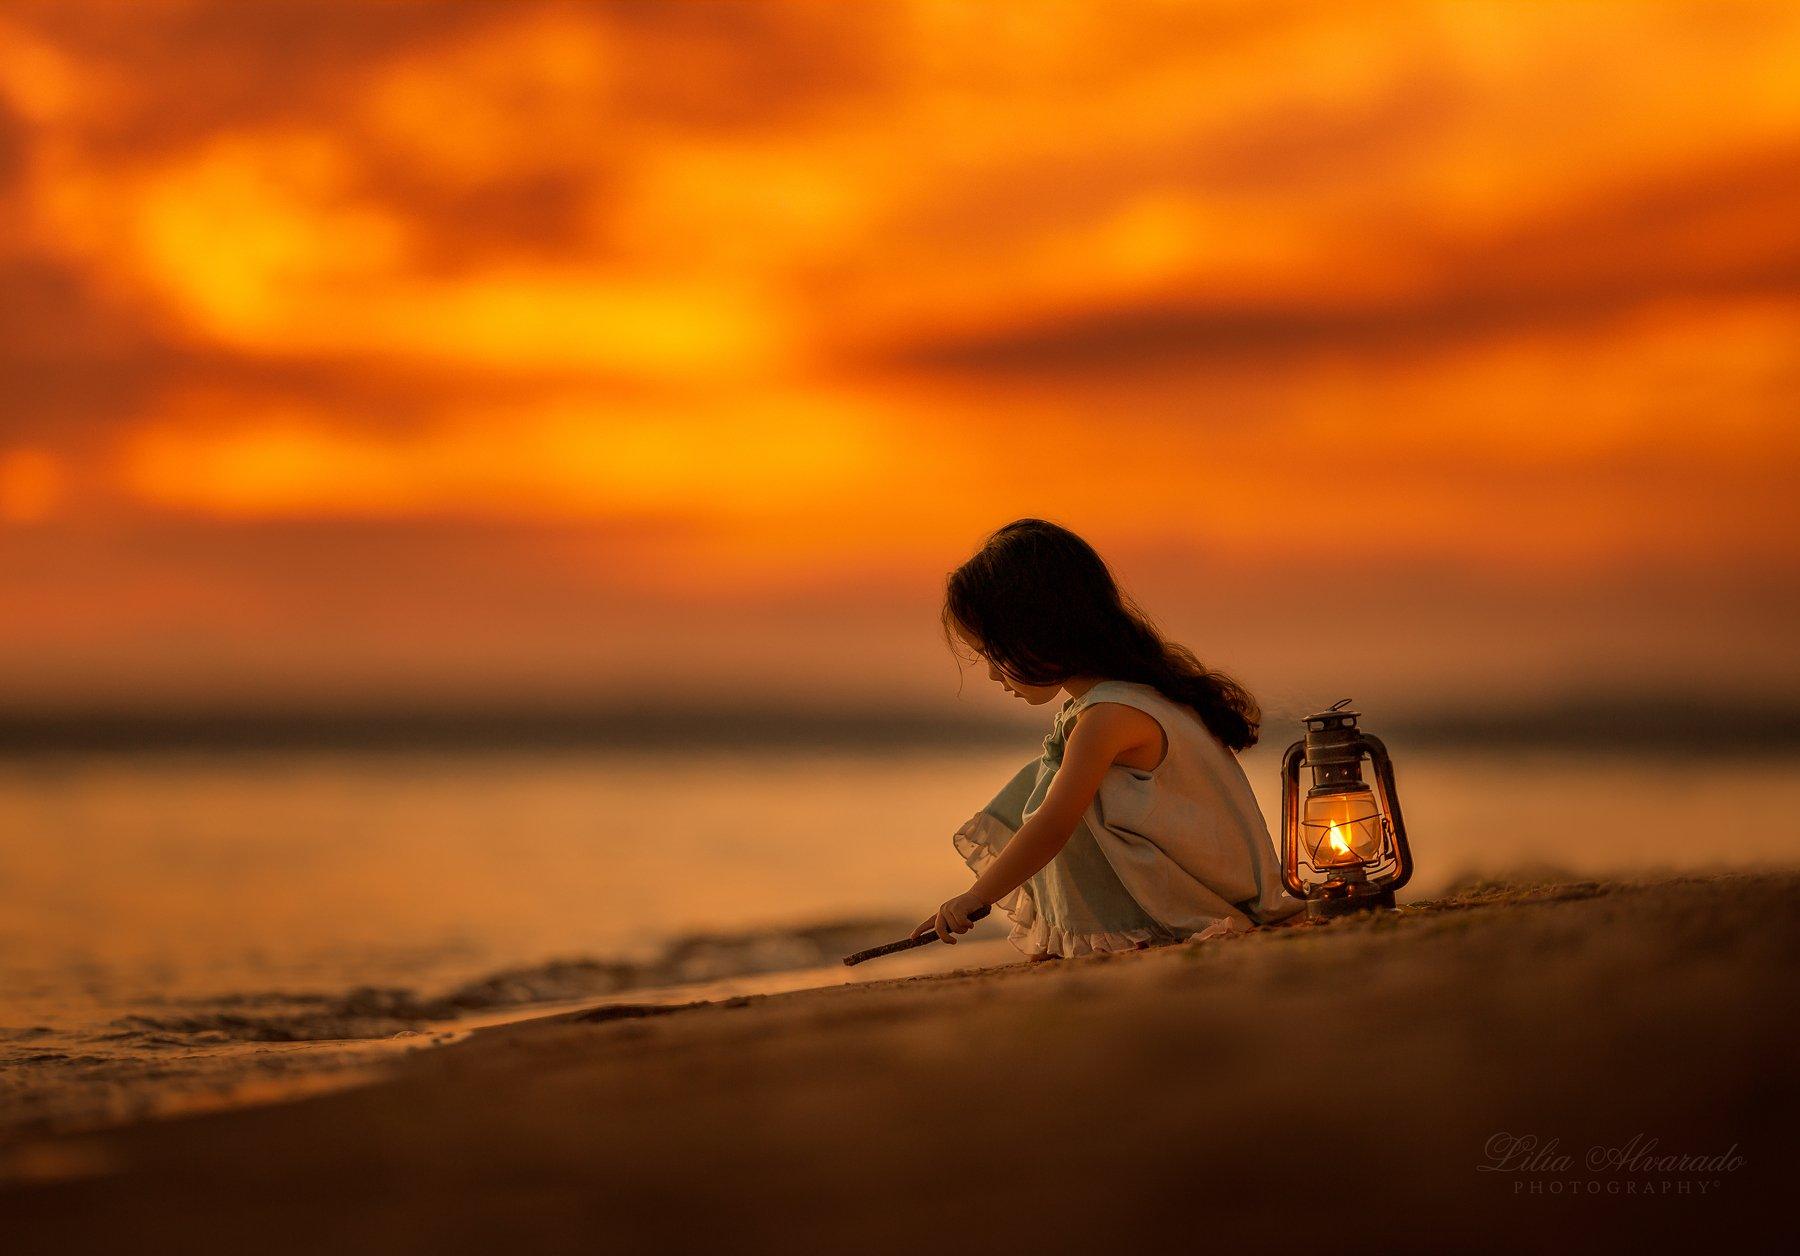 play,lantern,child,childhood,kids,children,calm,copyspace, sand,beach,lovely,water,sea,river, Lilia Alvarado